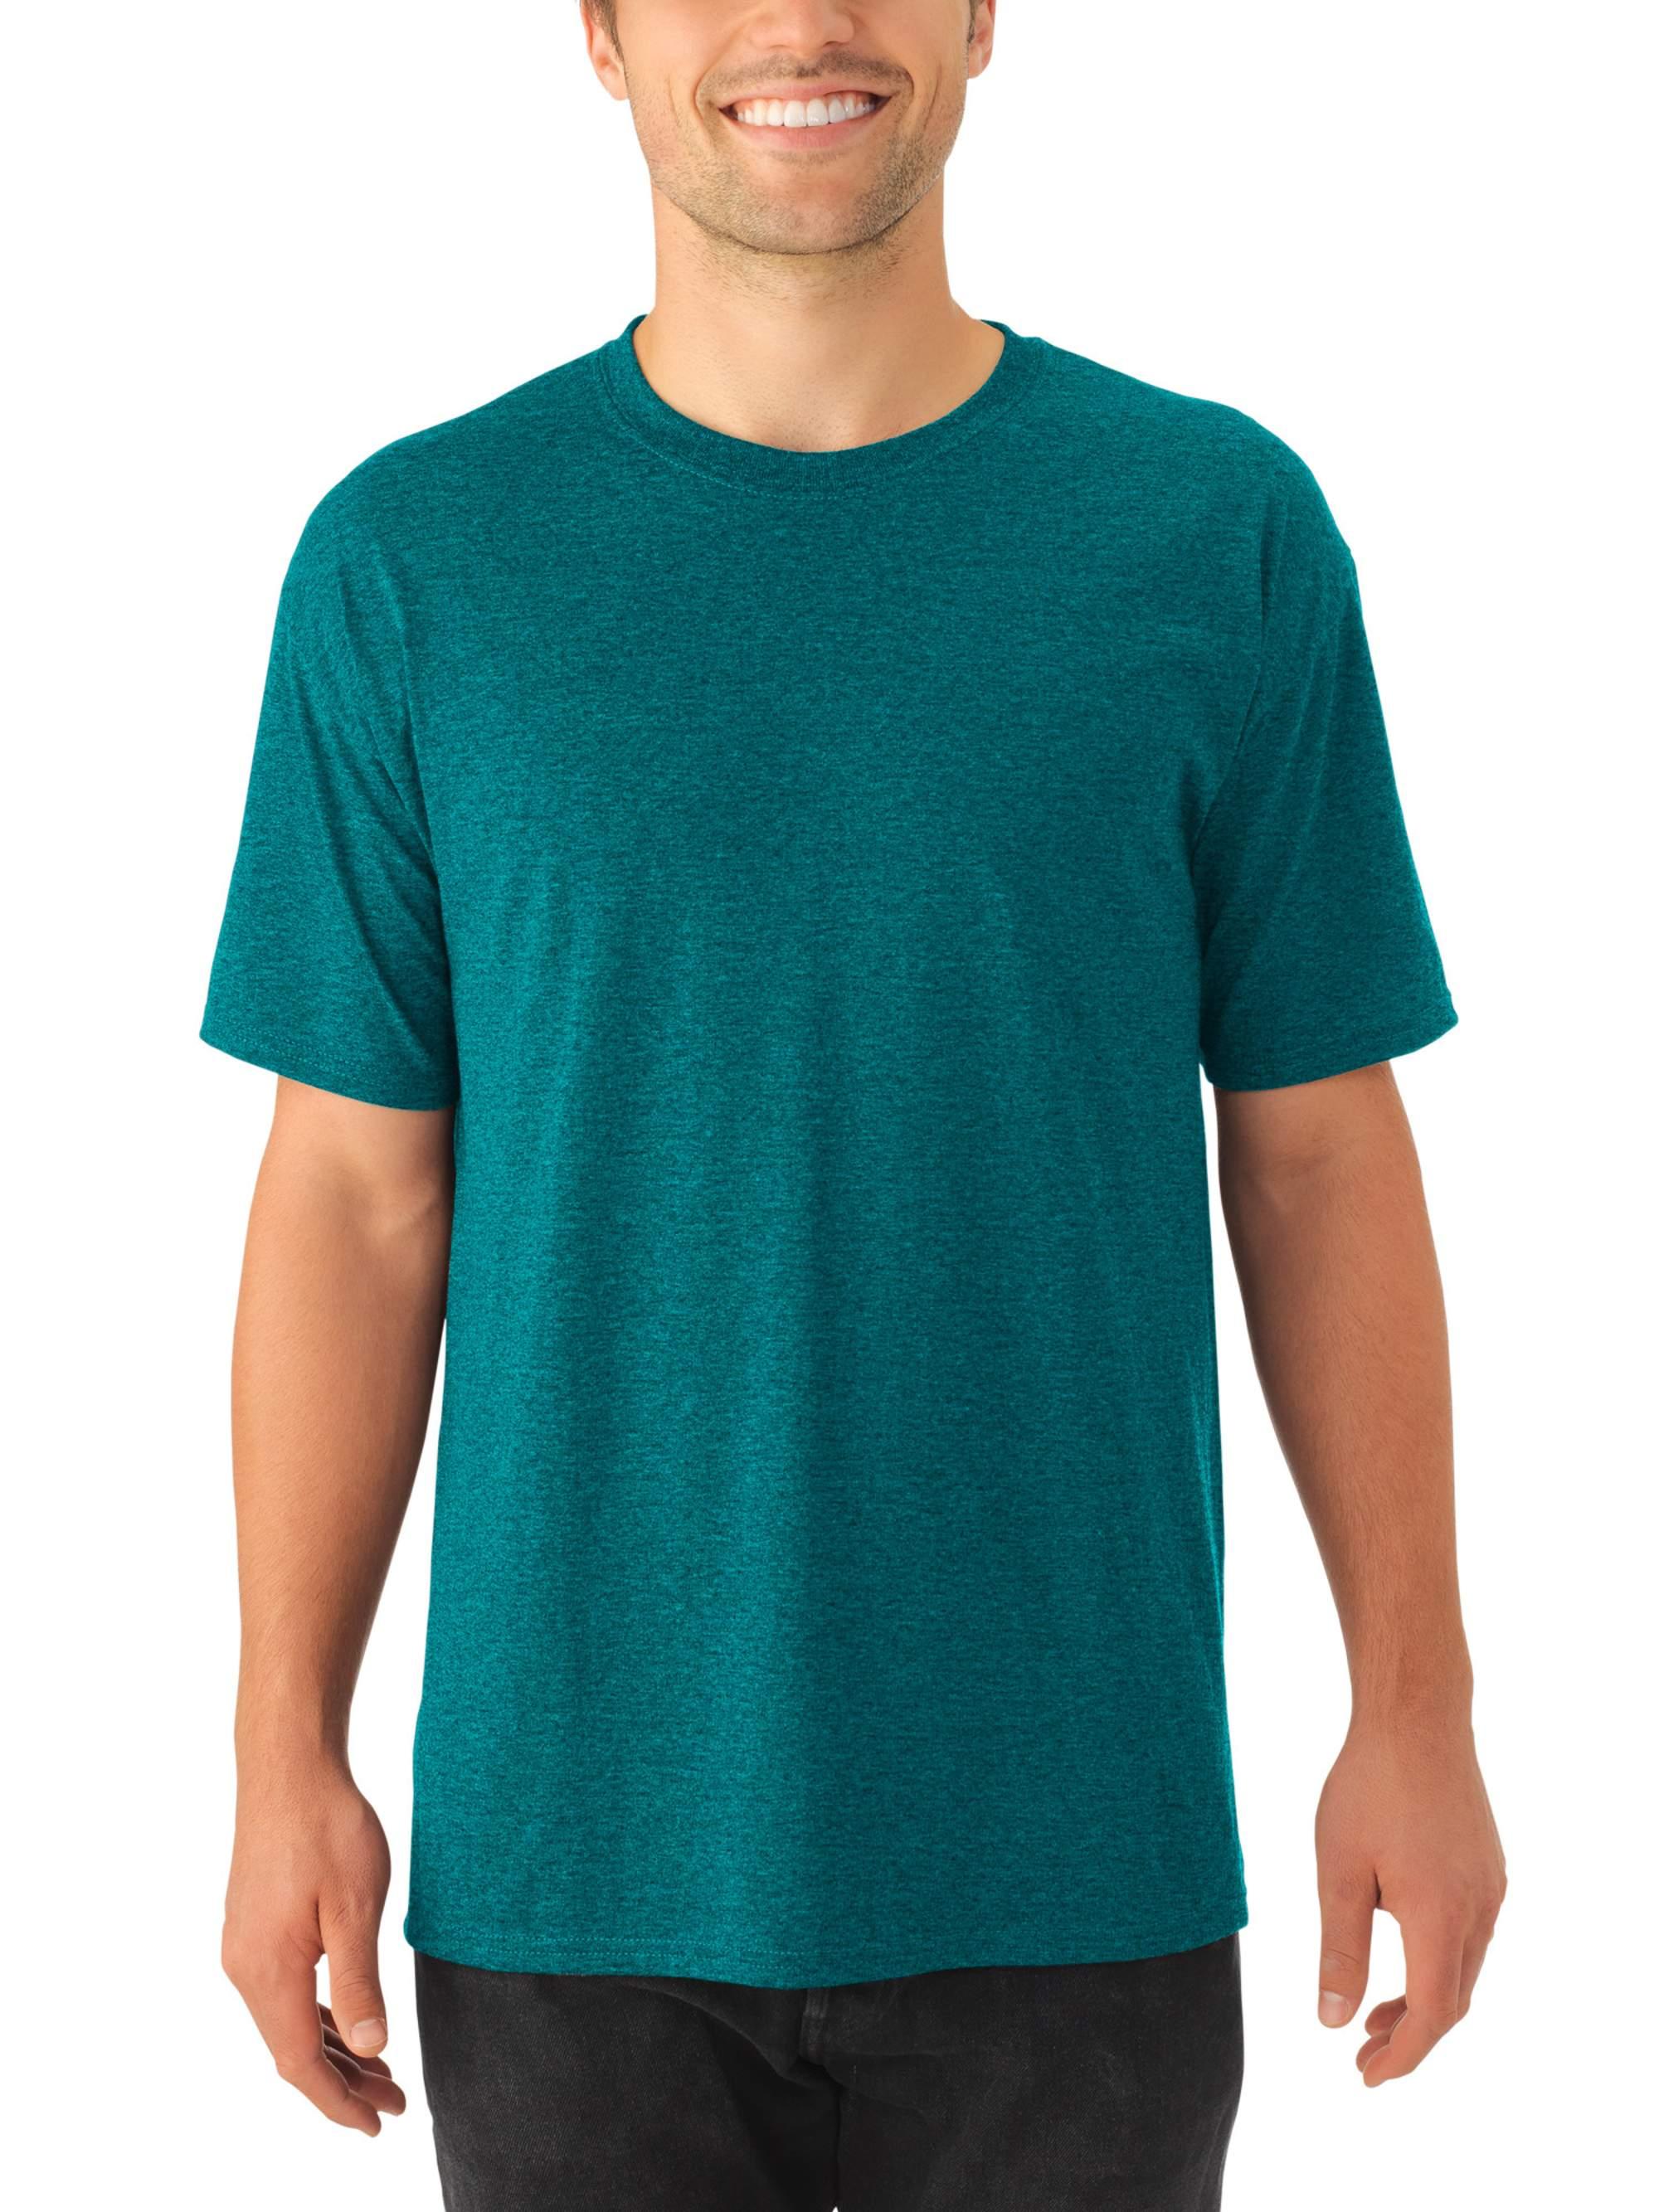 Men's Tri-blend Short Sleeve Crewneck T Shirt, 2 Pack